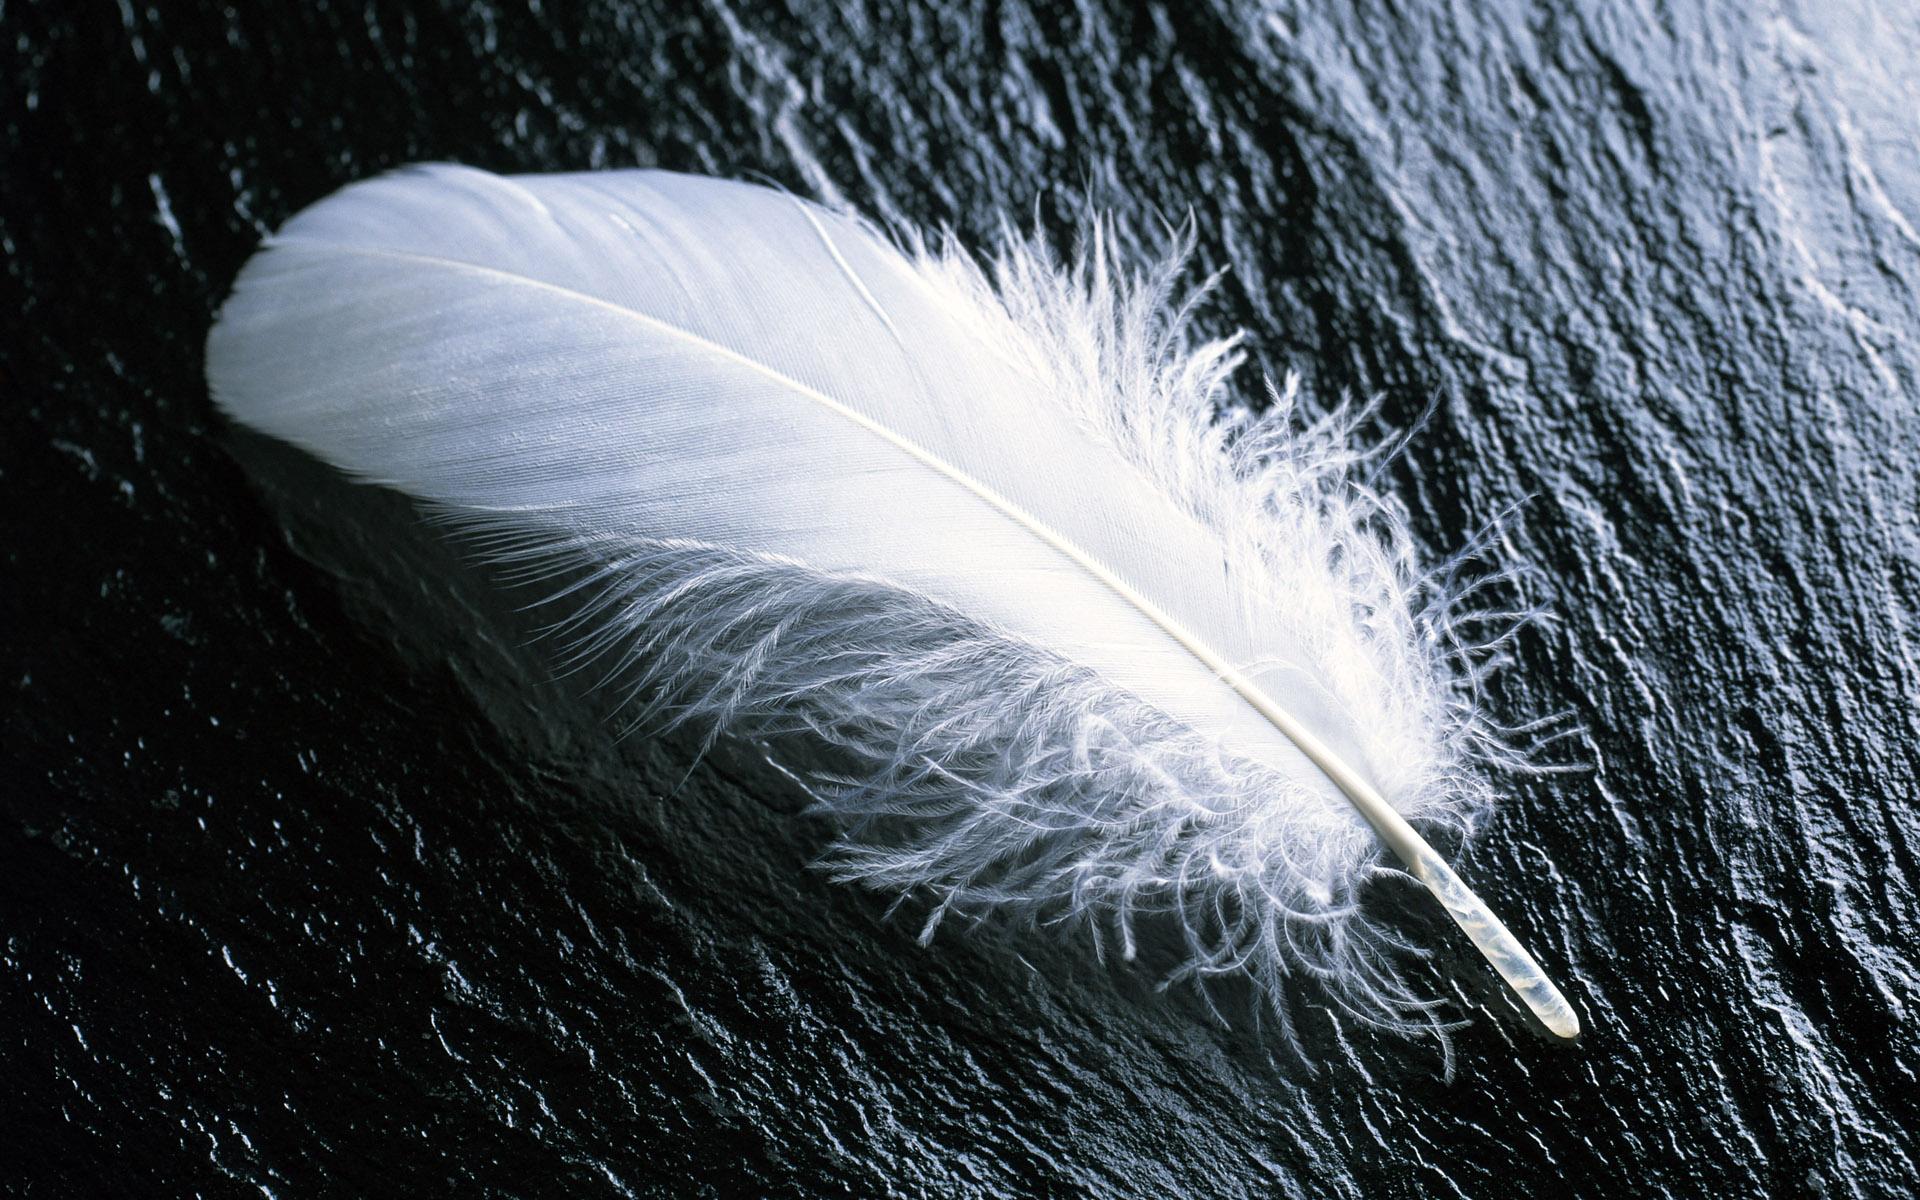 White feathers wallpaper Wallpaper Wide HD 1920x1200